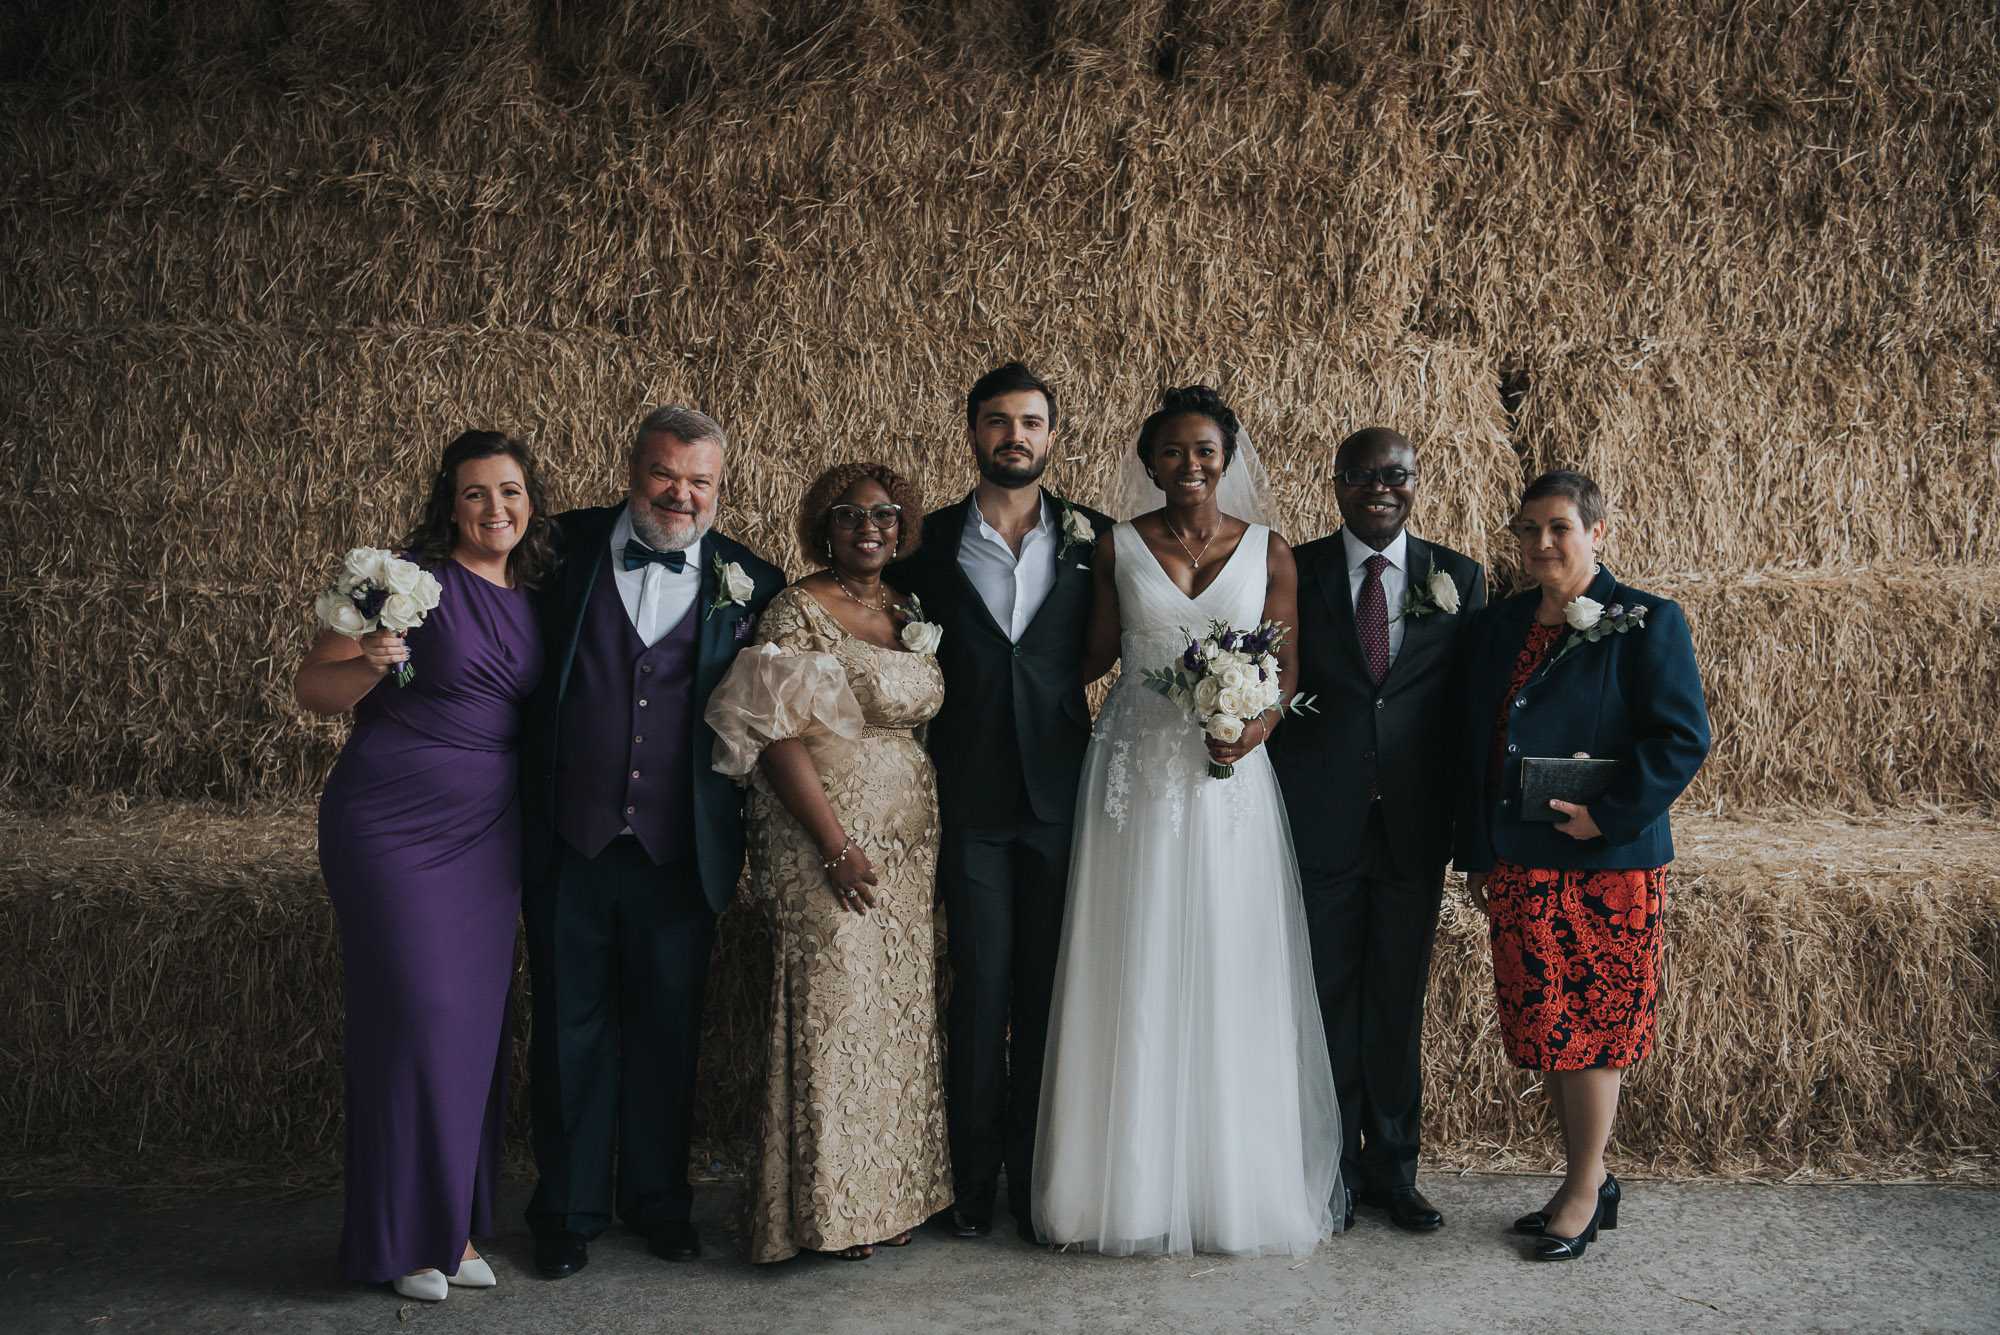 Owen HOuse Wedding Barn WEdding Photographer cheshire adam joe roberts photography (26 of 36).jpg